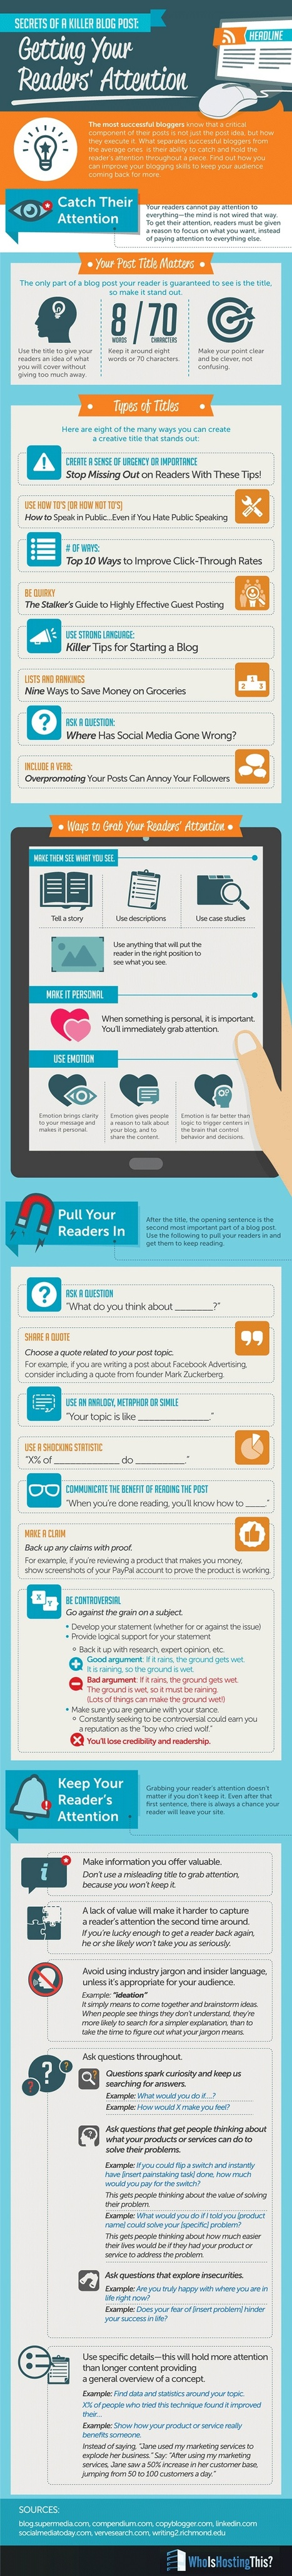 Secrets of a Killer Blog Post [Infographic] | Integrated Digital Marketing | Scoop.it